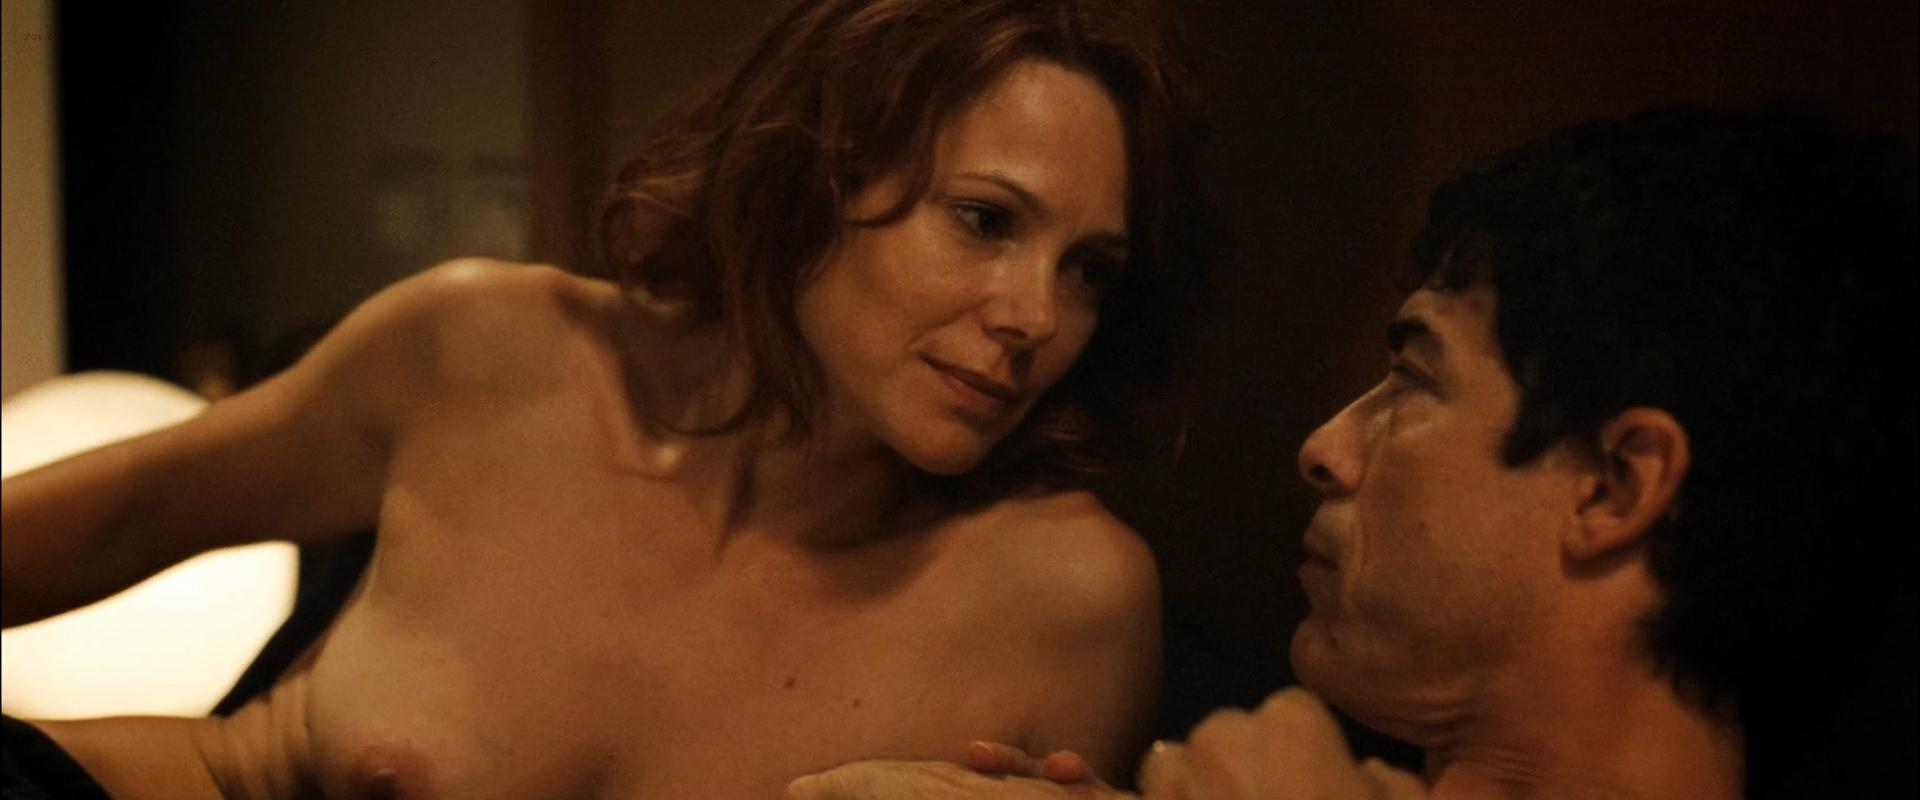 Barbora Bobulova nude full frontal - I nostri ragazzi (IT-2014) hd1080p (8)